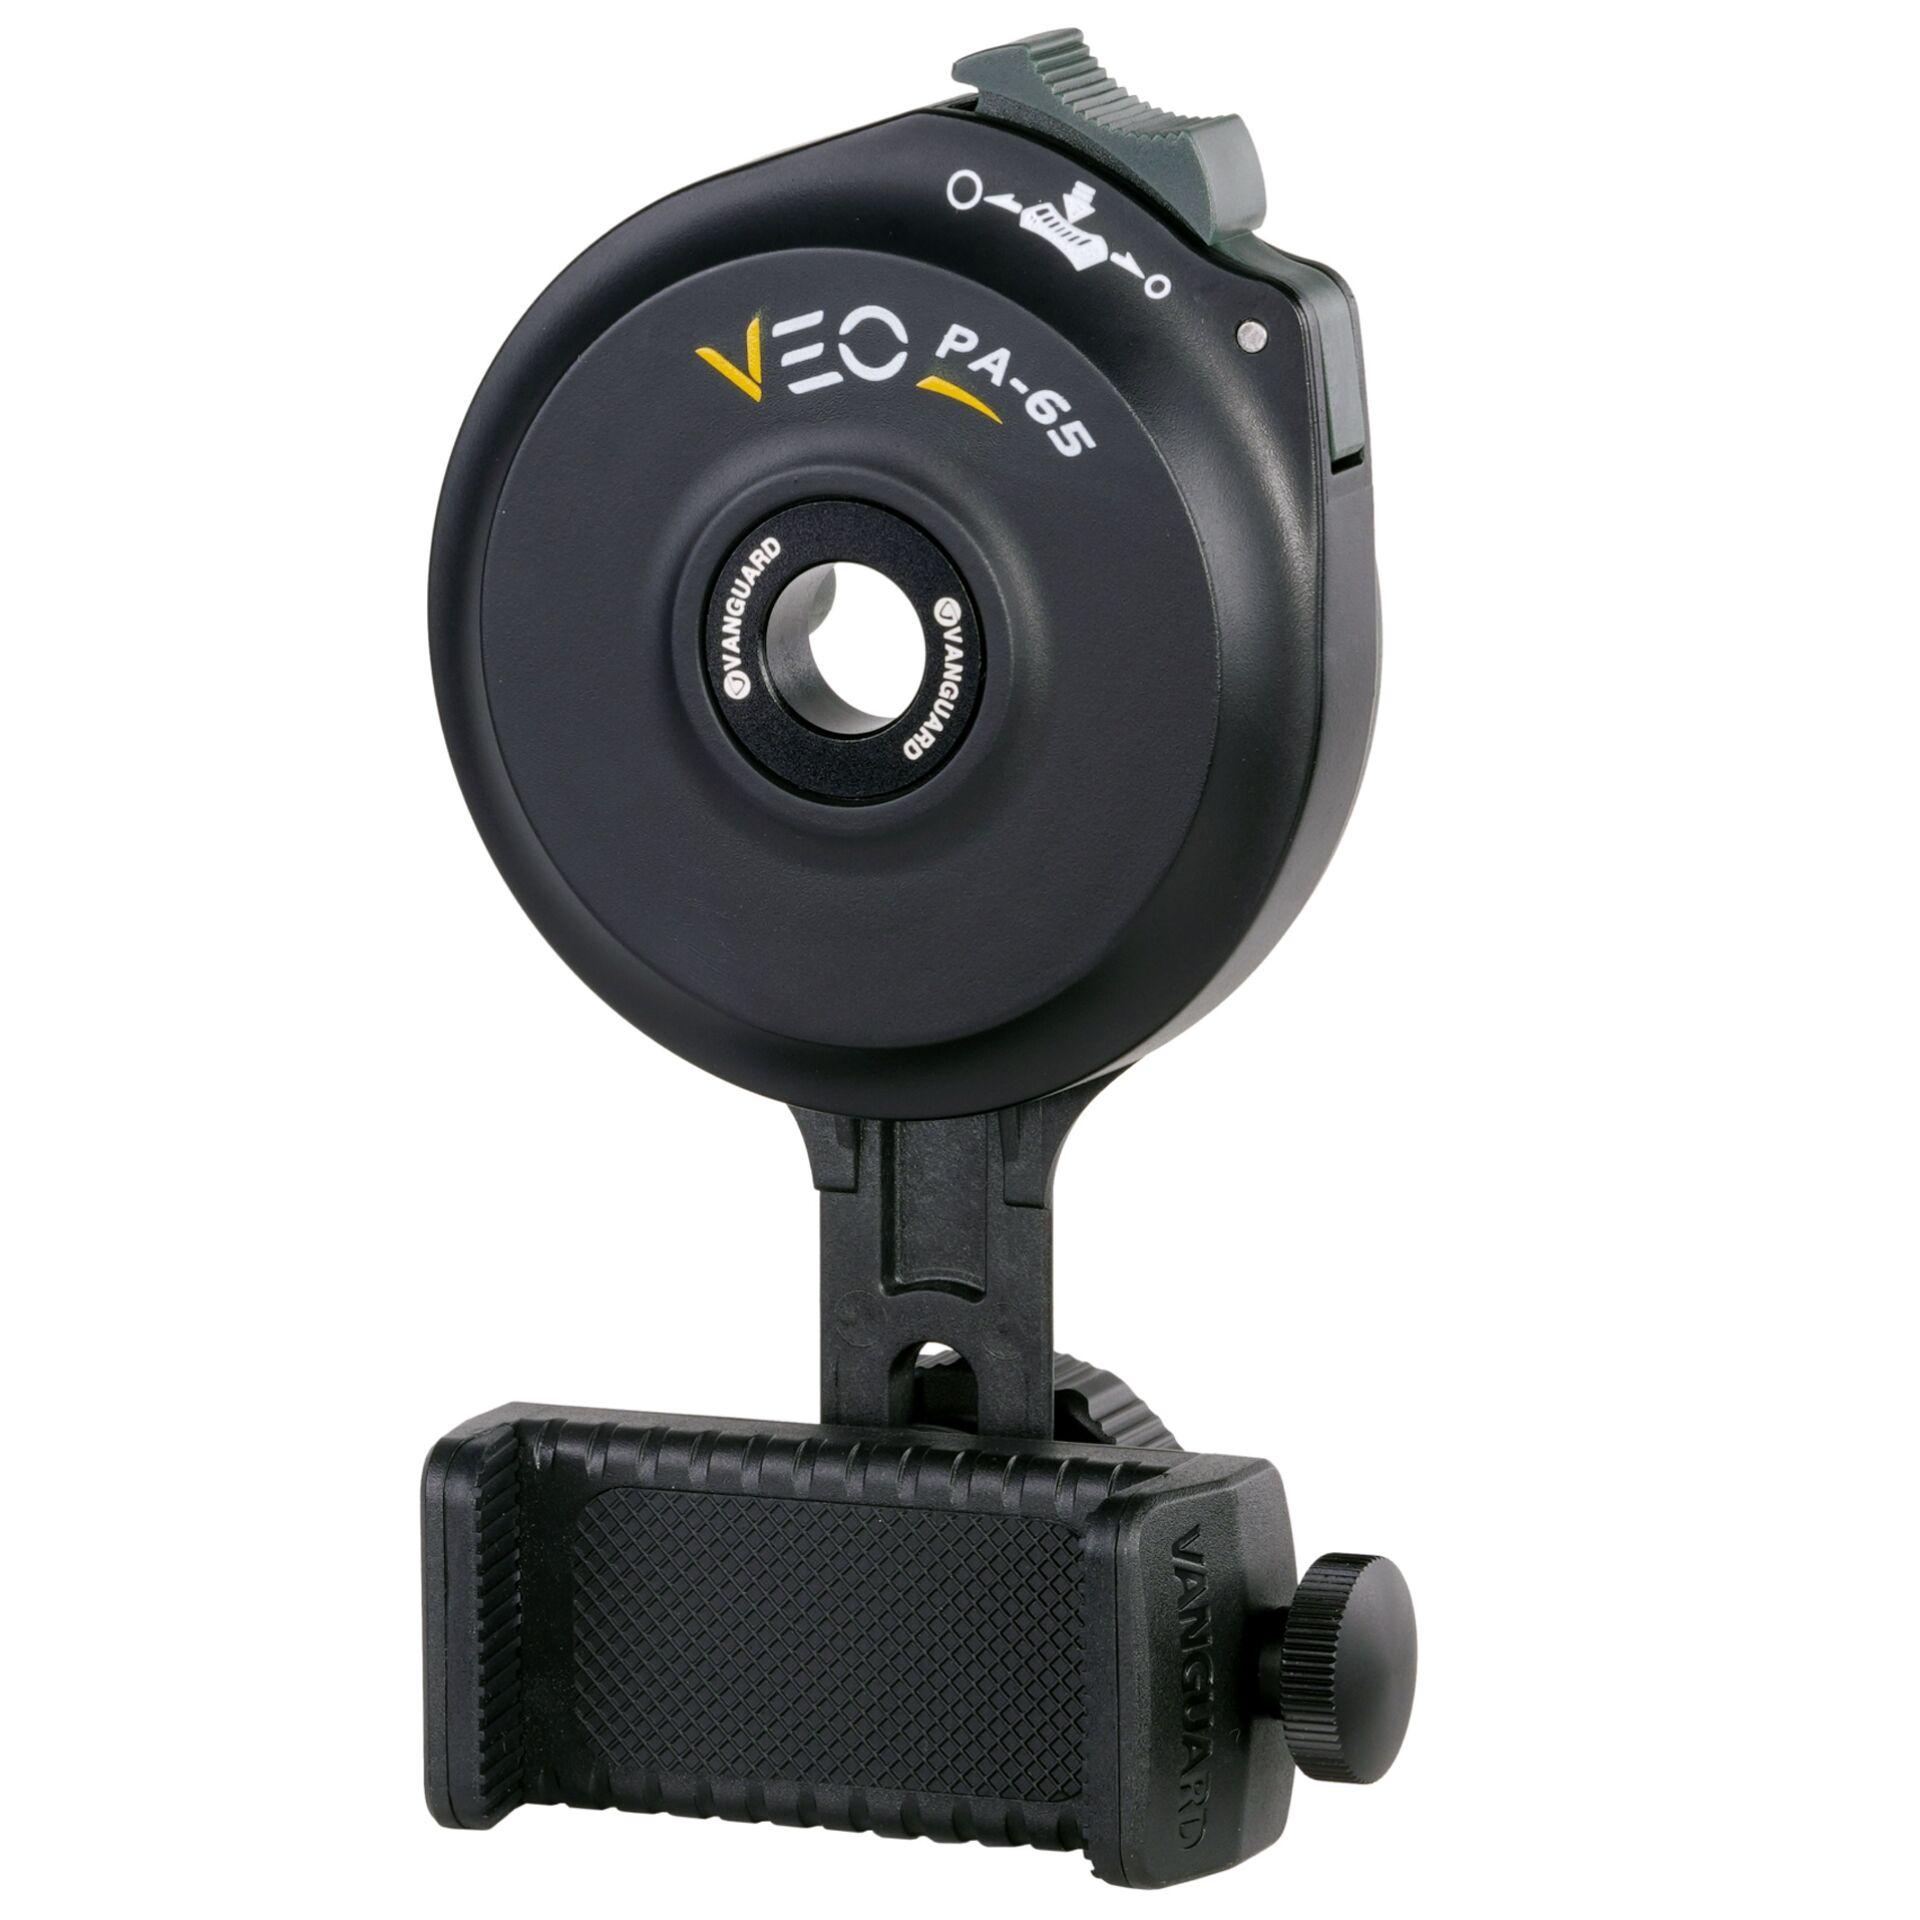 Vanguard VEO PA-65 Handy adapter for Binoculars